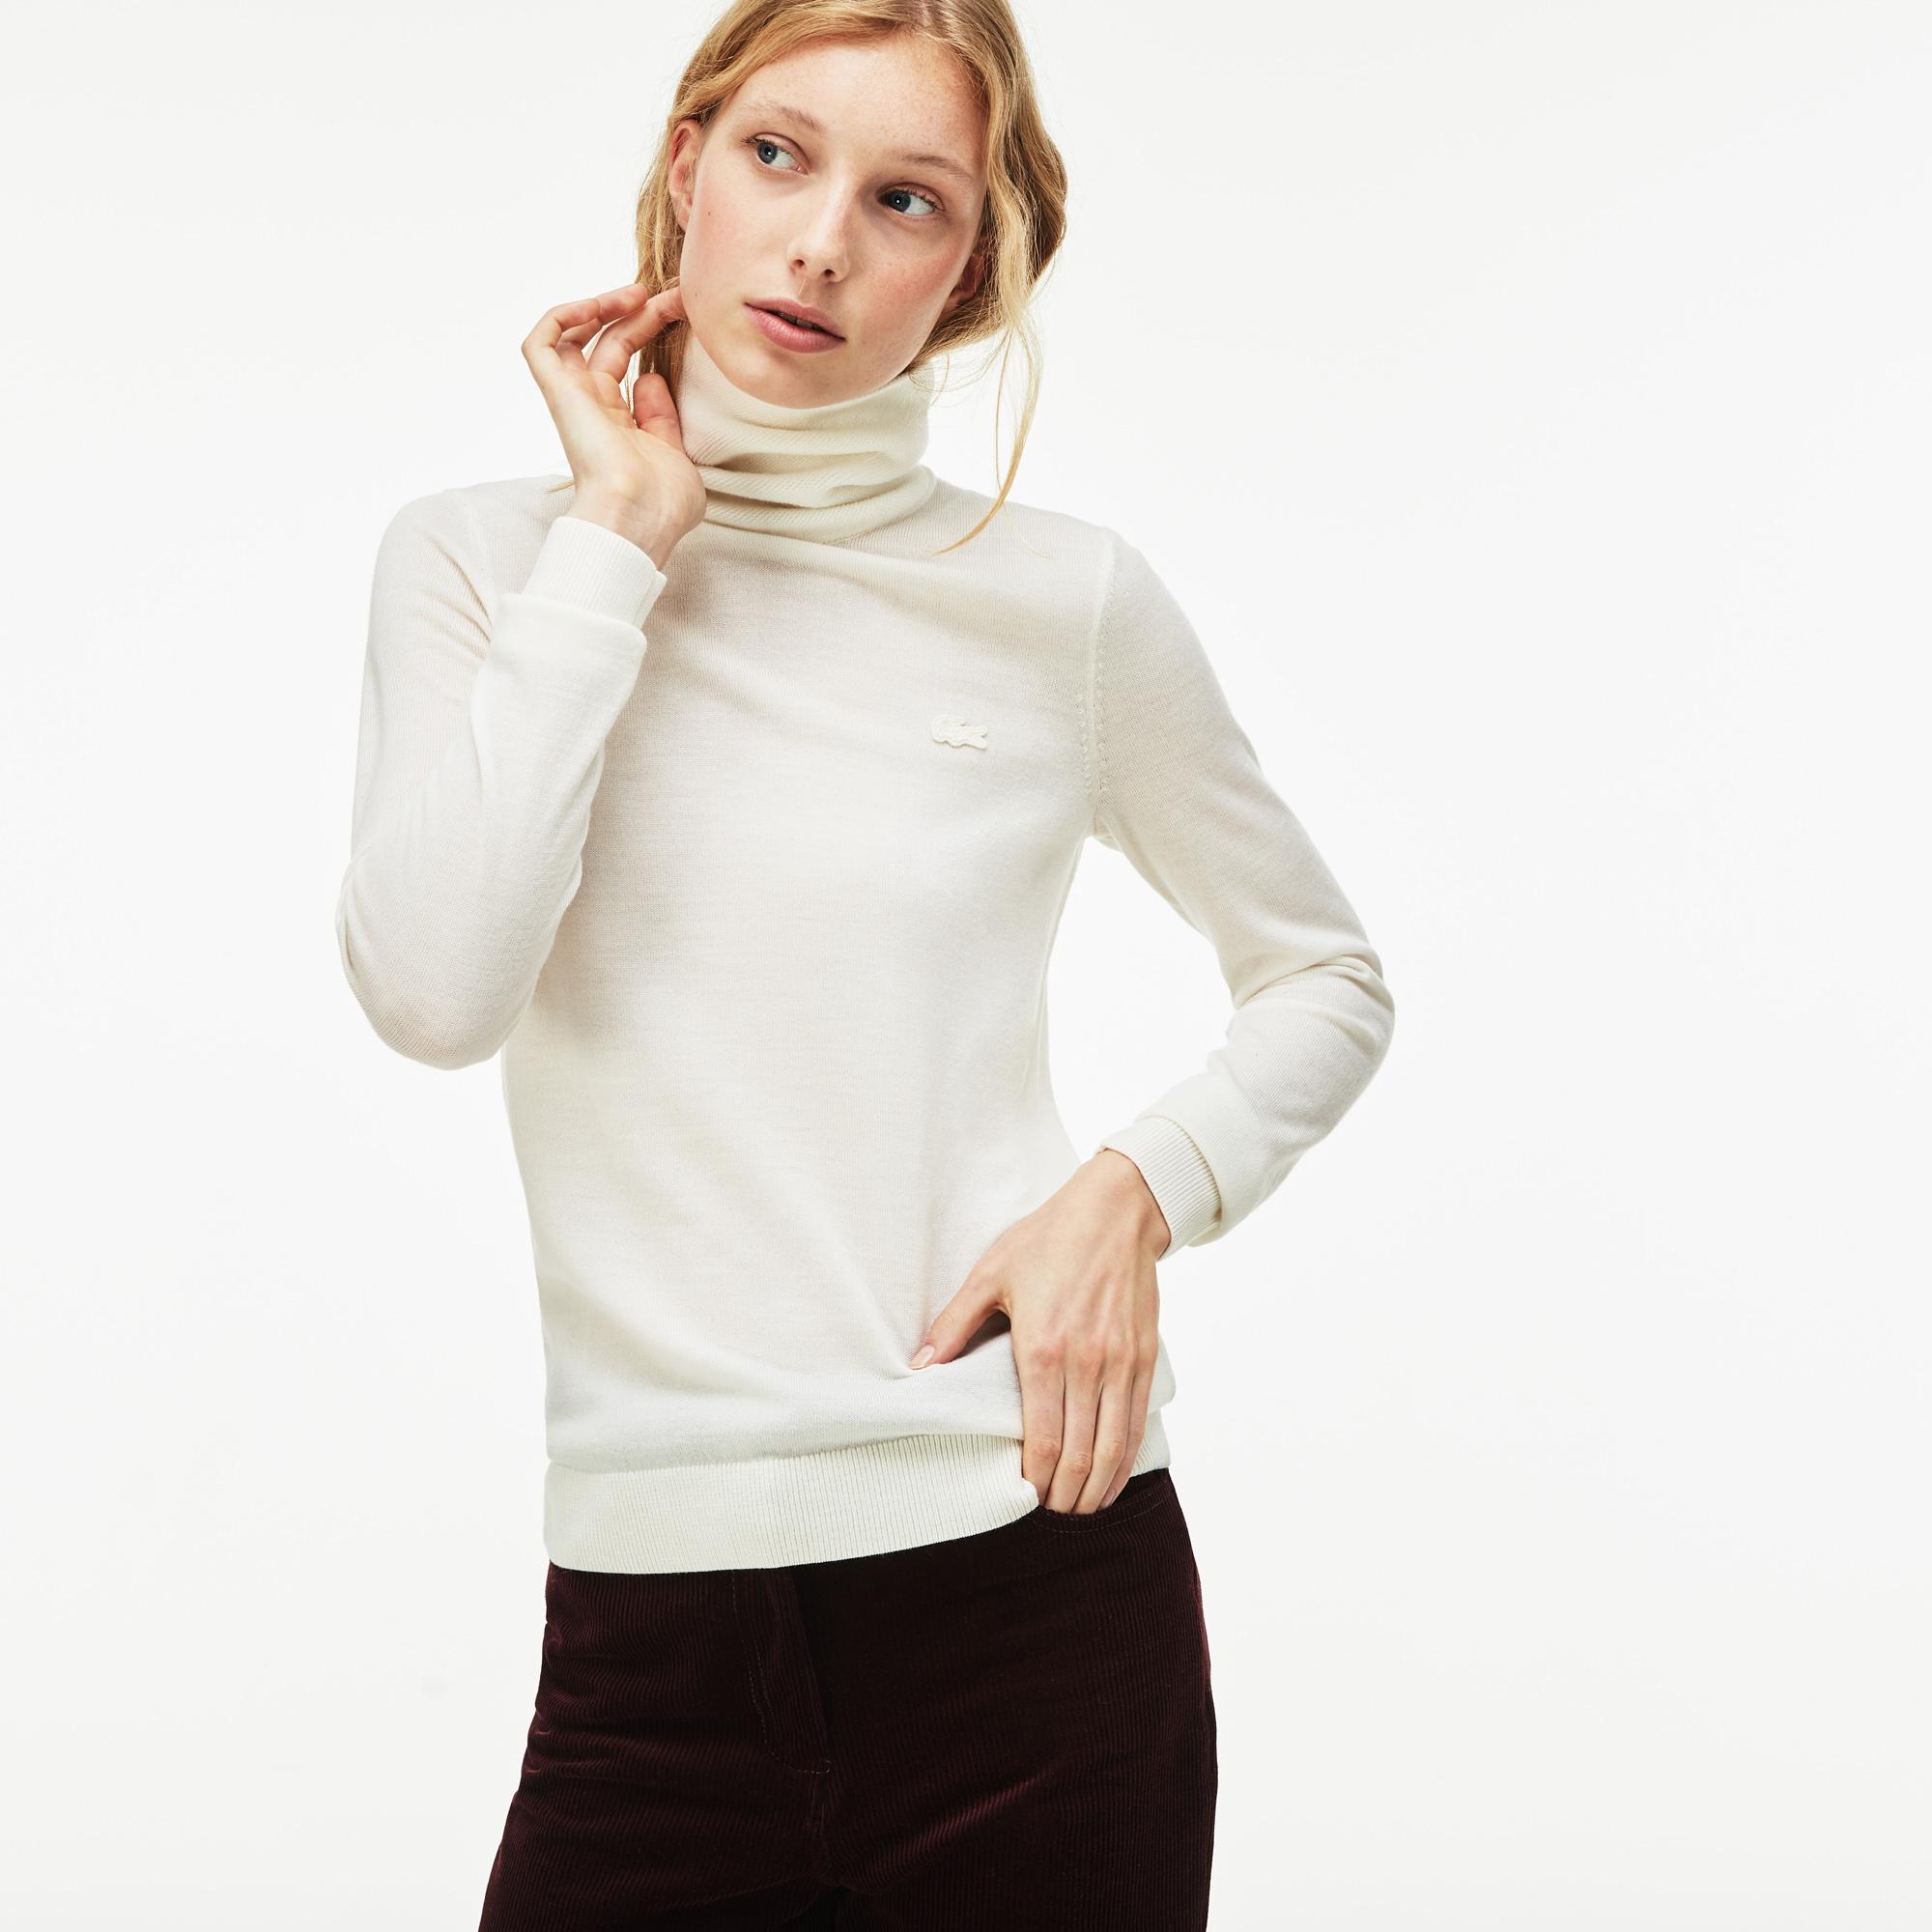 Фото 4 - Женский свитер Lacoste белого цвета